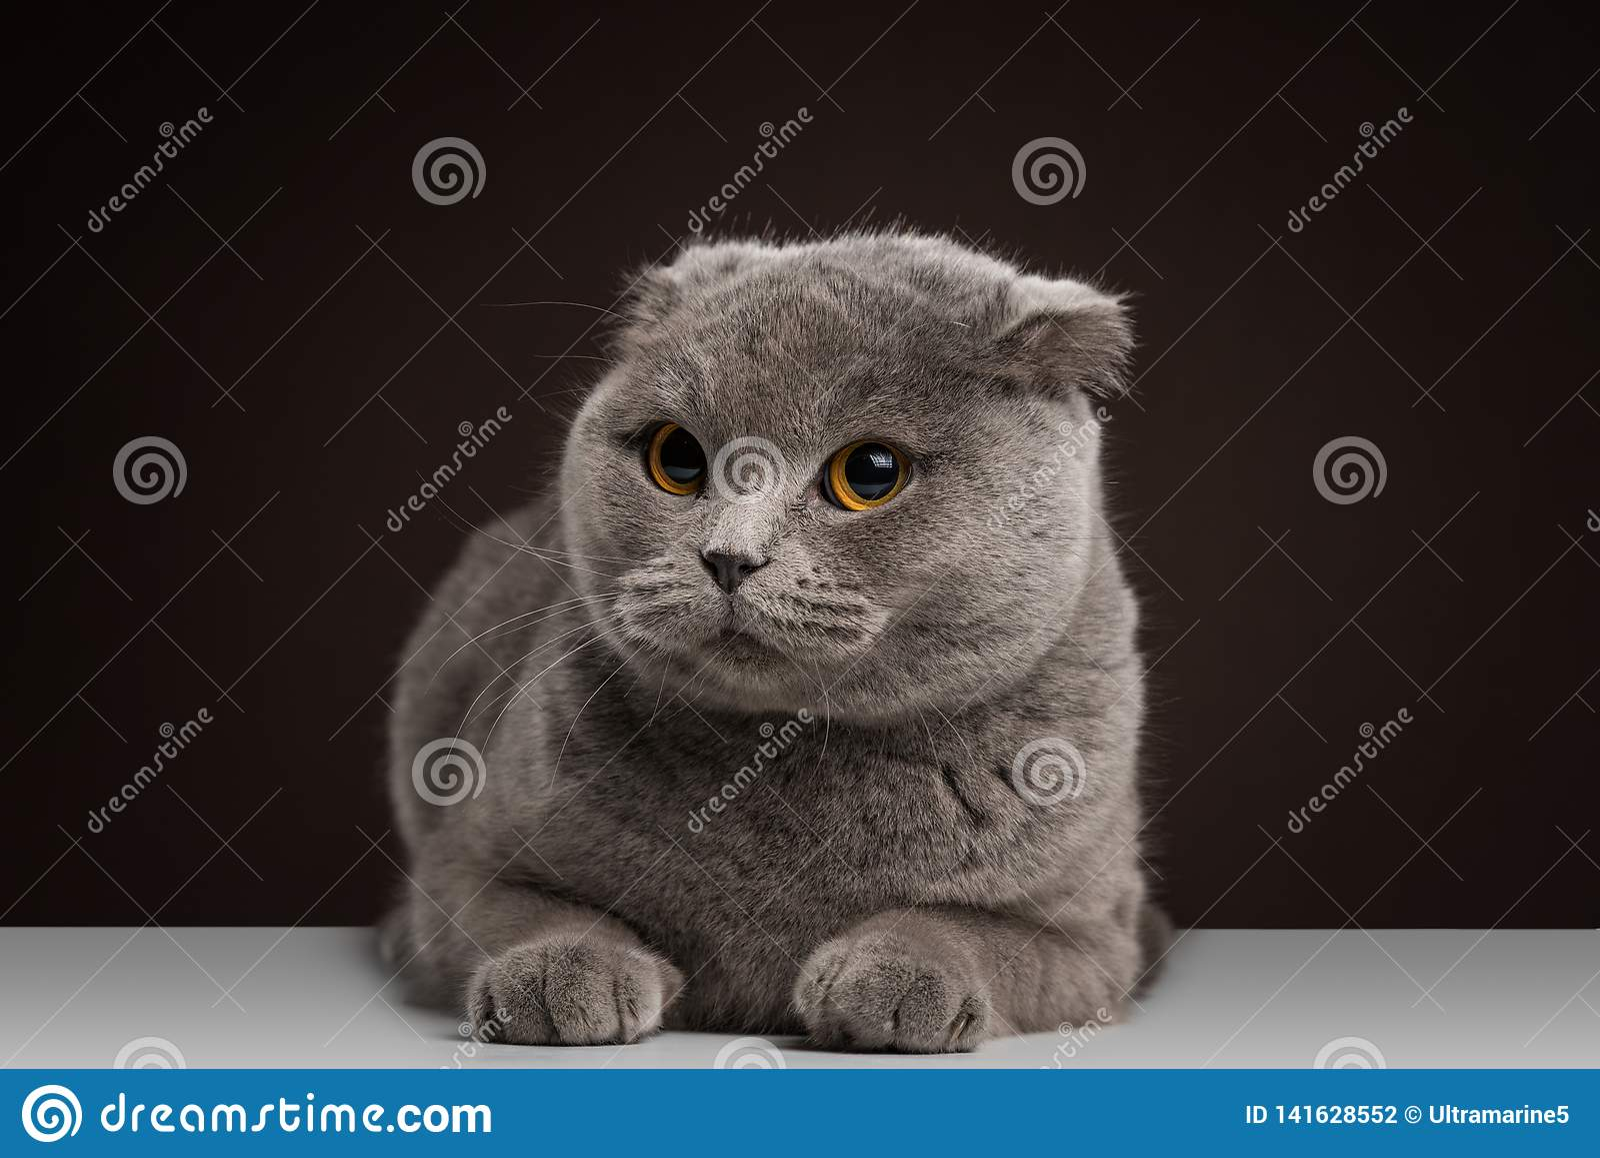 British Shorthair And Scottish Fold Mix 81021 Nama Untuk Kucing Comel Lucu Dan Unik